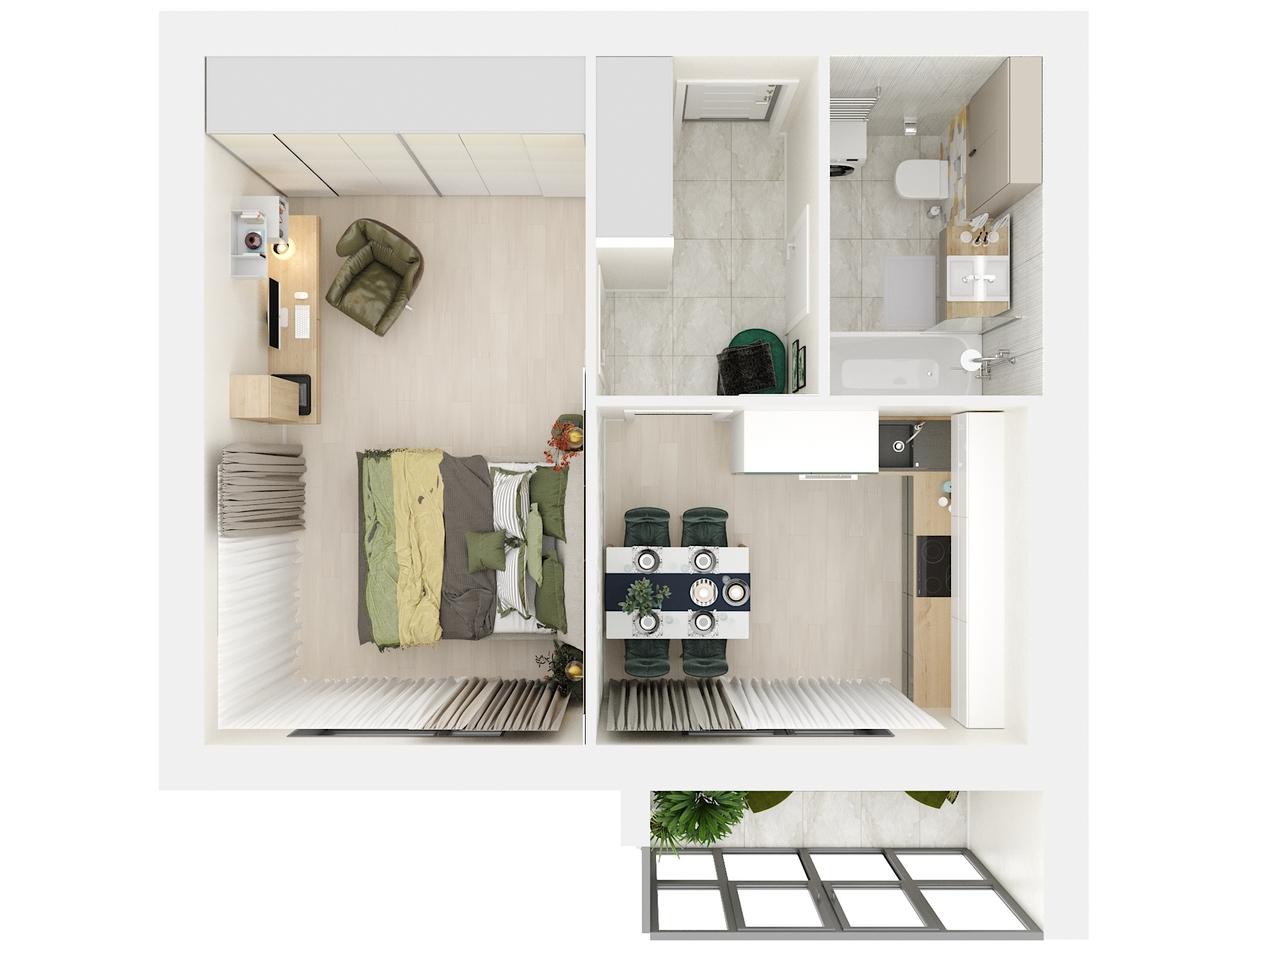 Дом 1 - 1-комнатная квартира №2